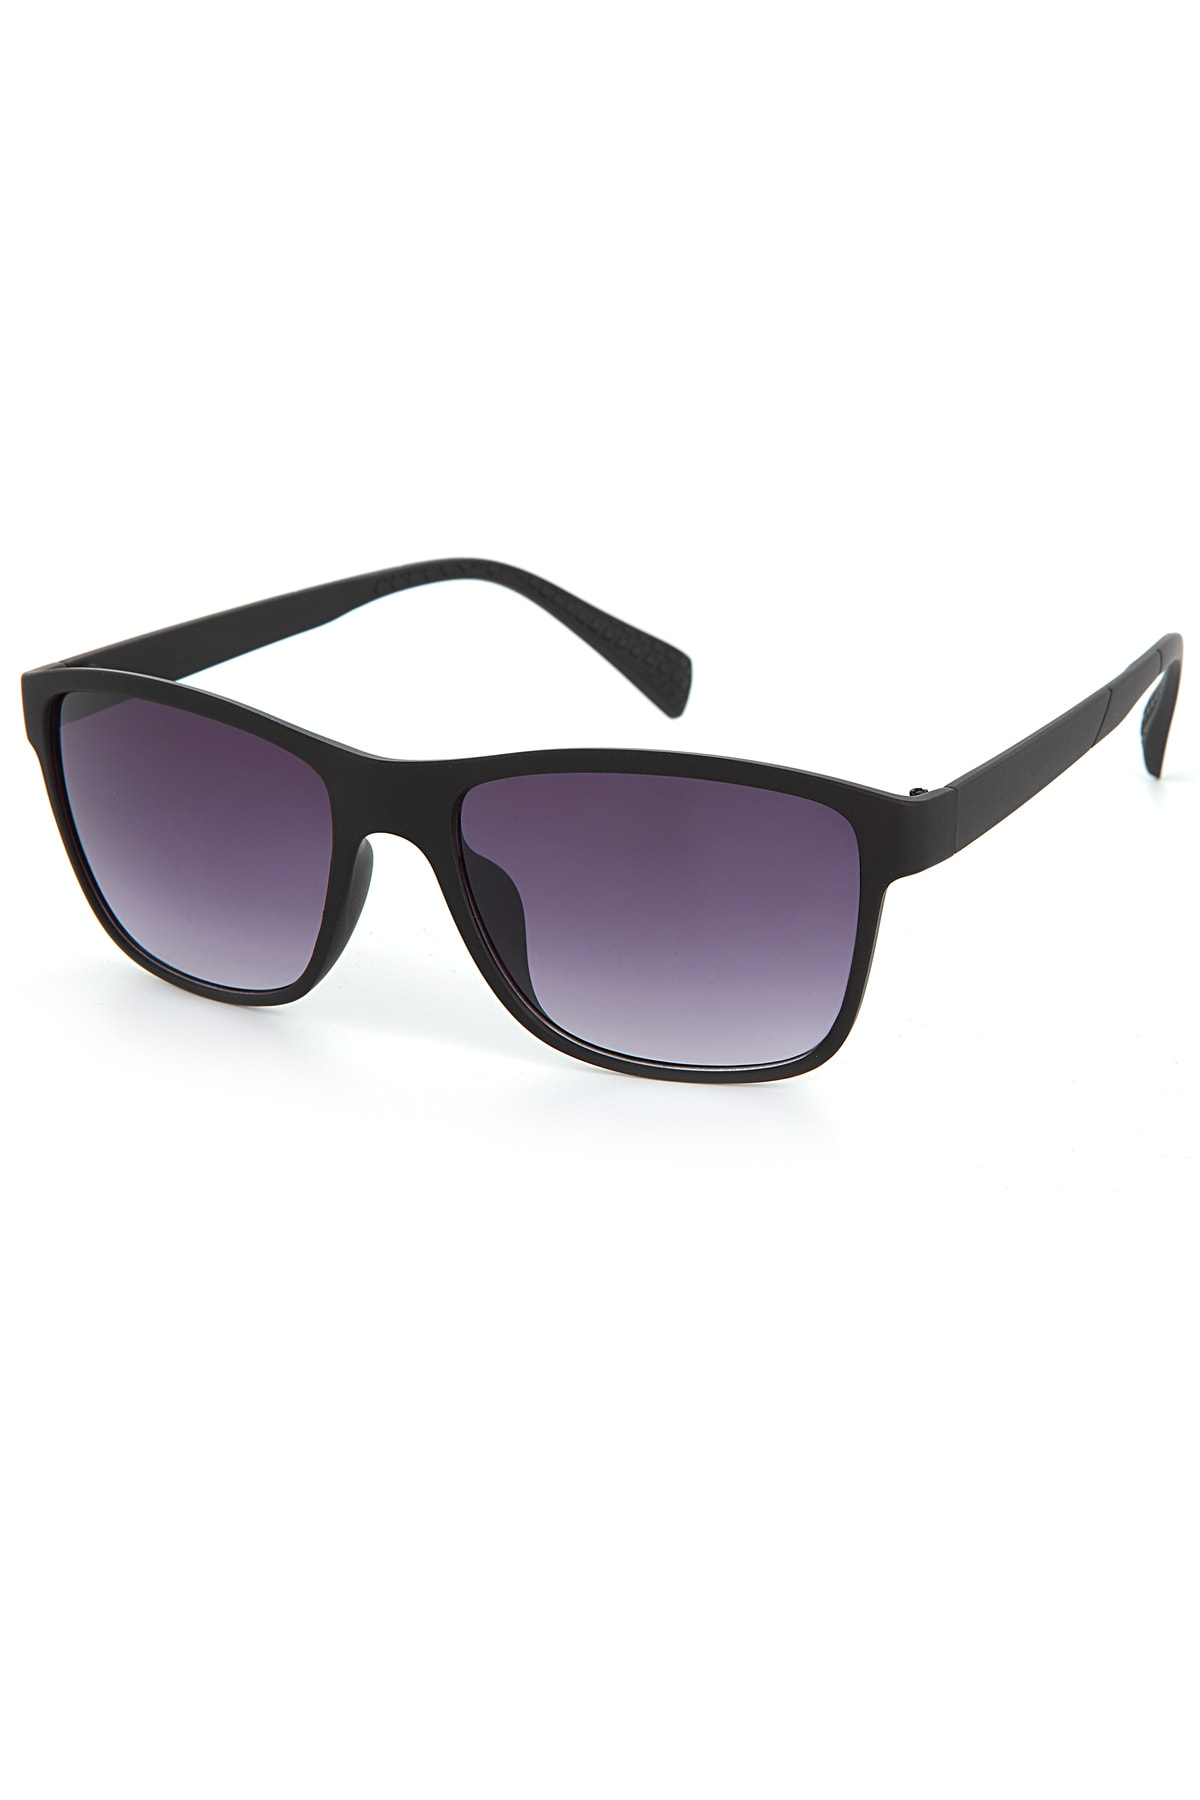 خرید عینک آفتابی  برند Luis Polo رنگ مشکی کد ty58570942